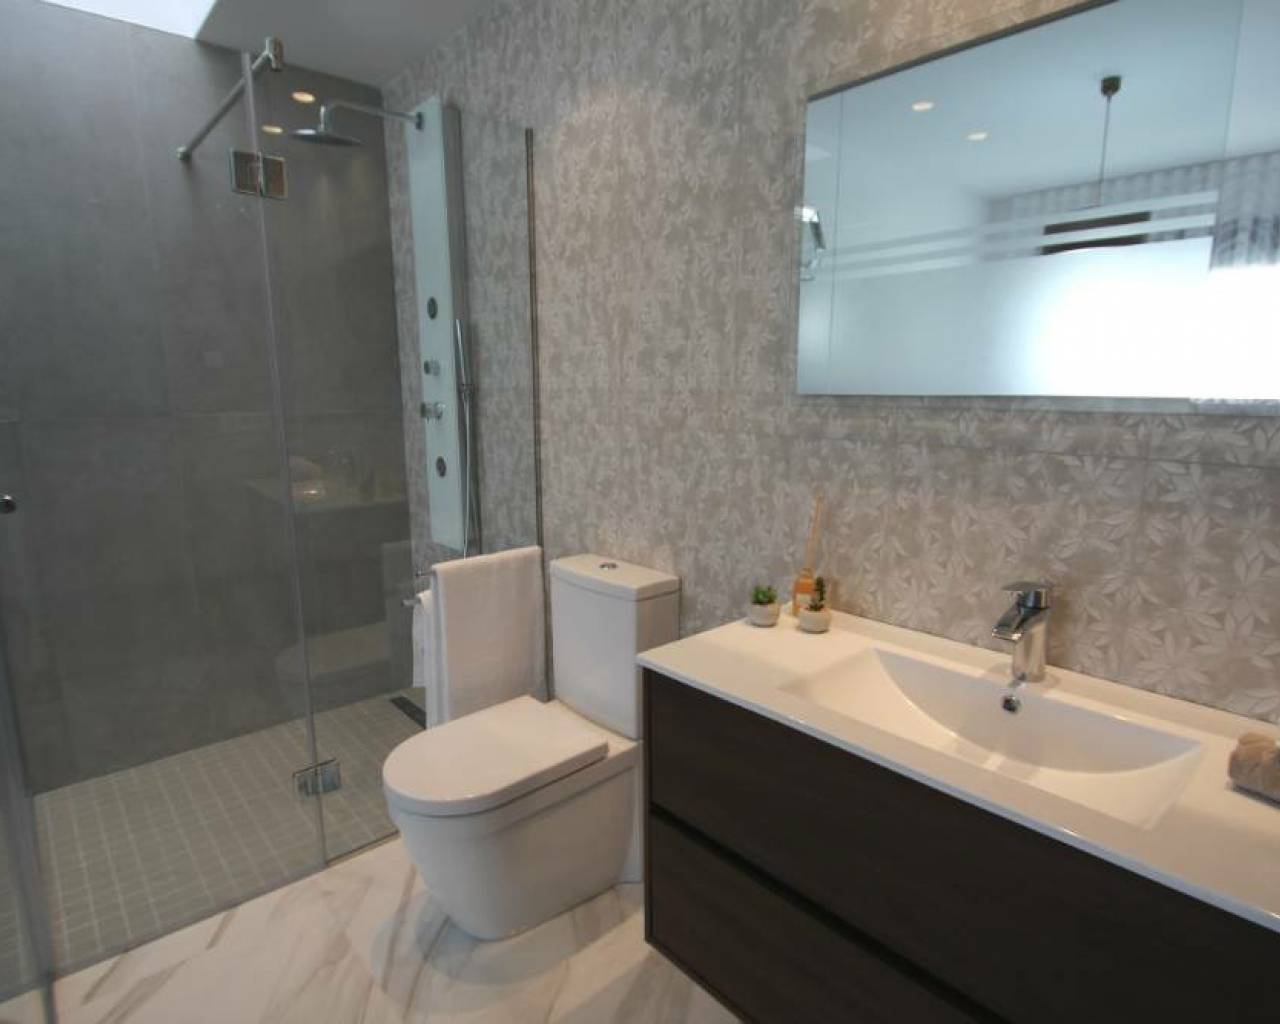 nieuwbouw-appartement-san-miguel-de-salinas_323_xl